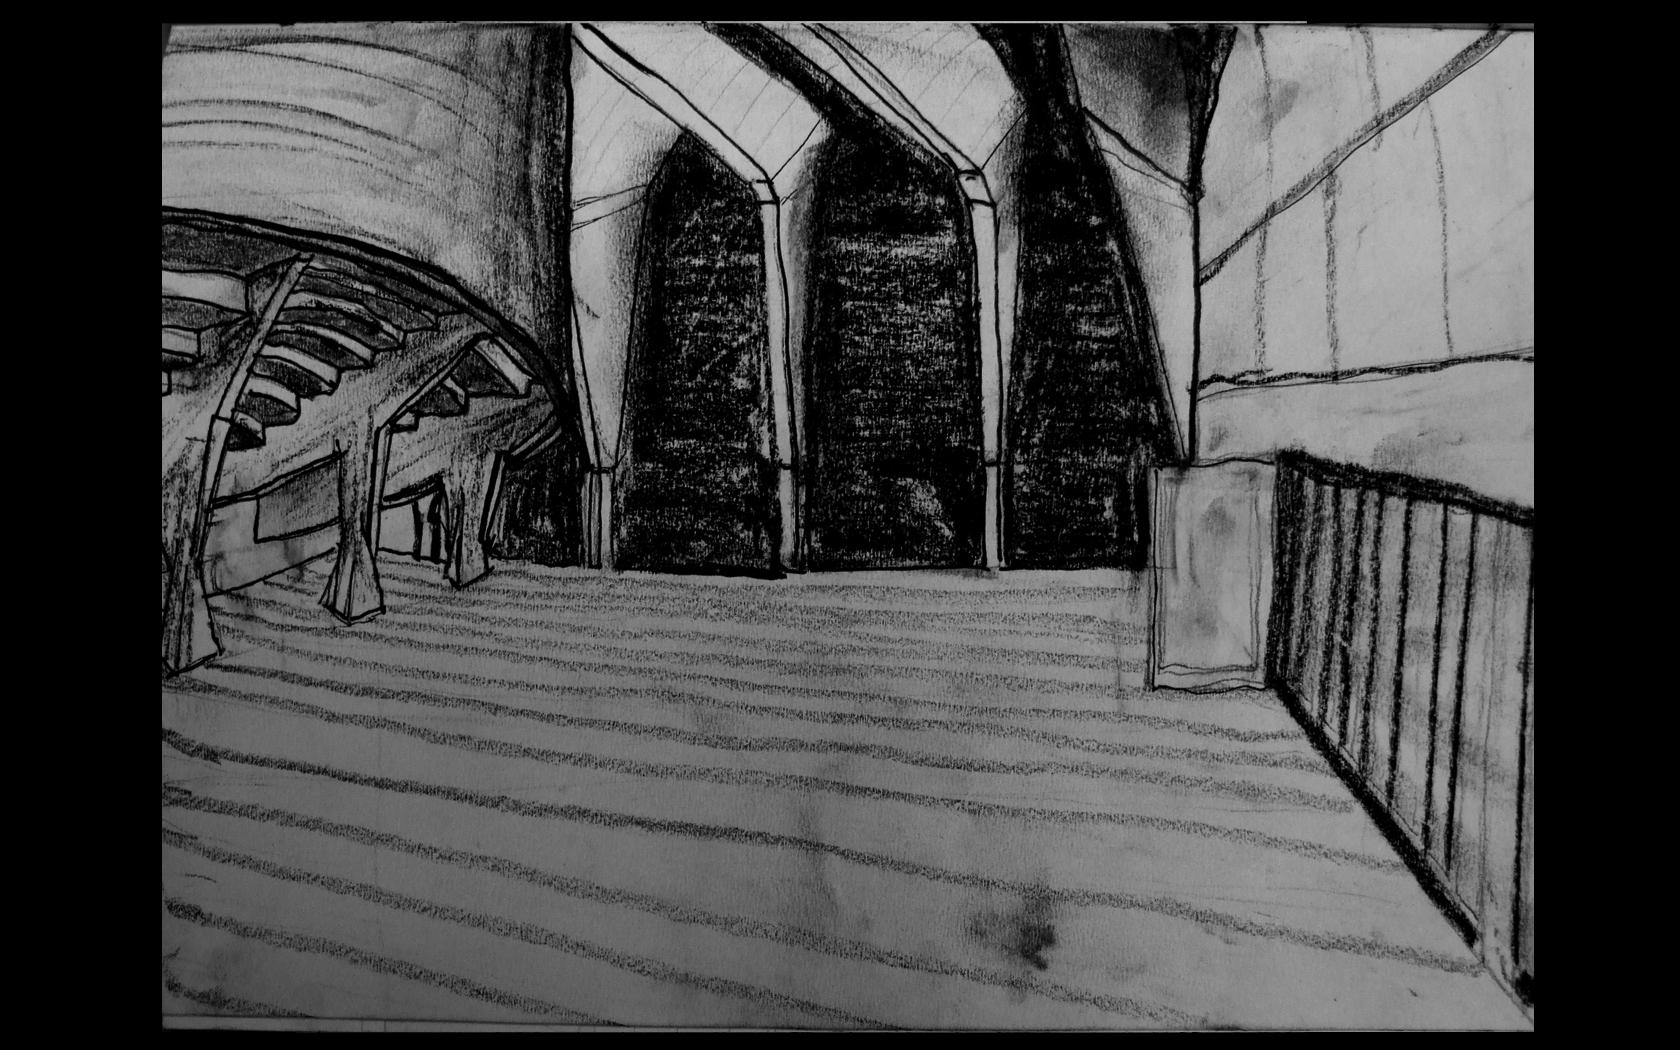 Drawings-Interiors | architettura